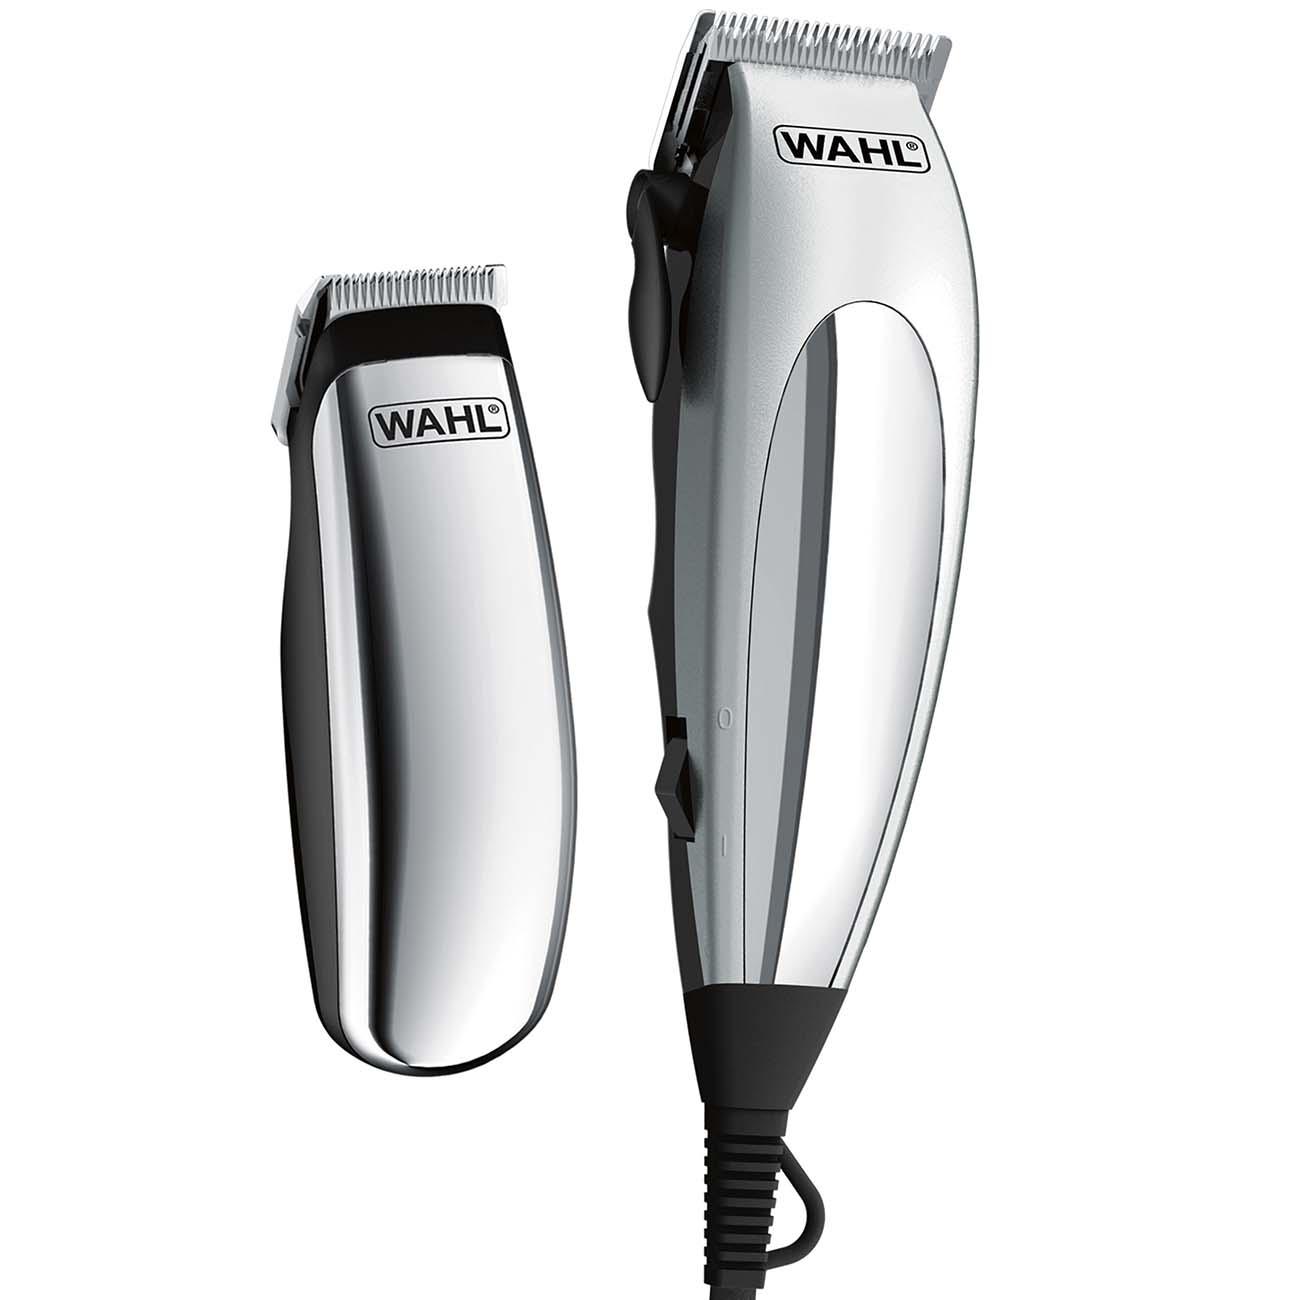 Машинка для стрижки волос Wahl HomePro Deluxe (79305-1316) фото